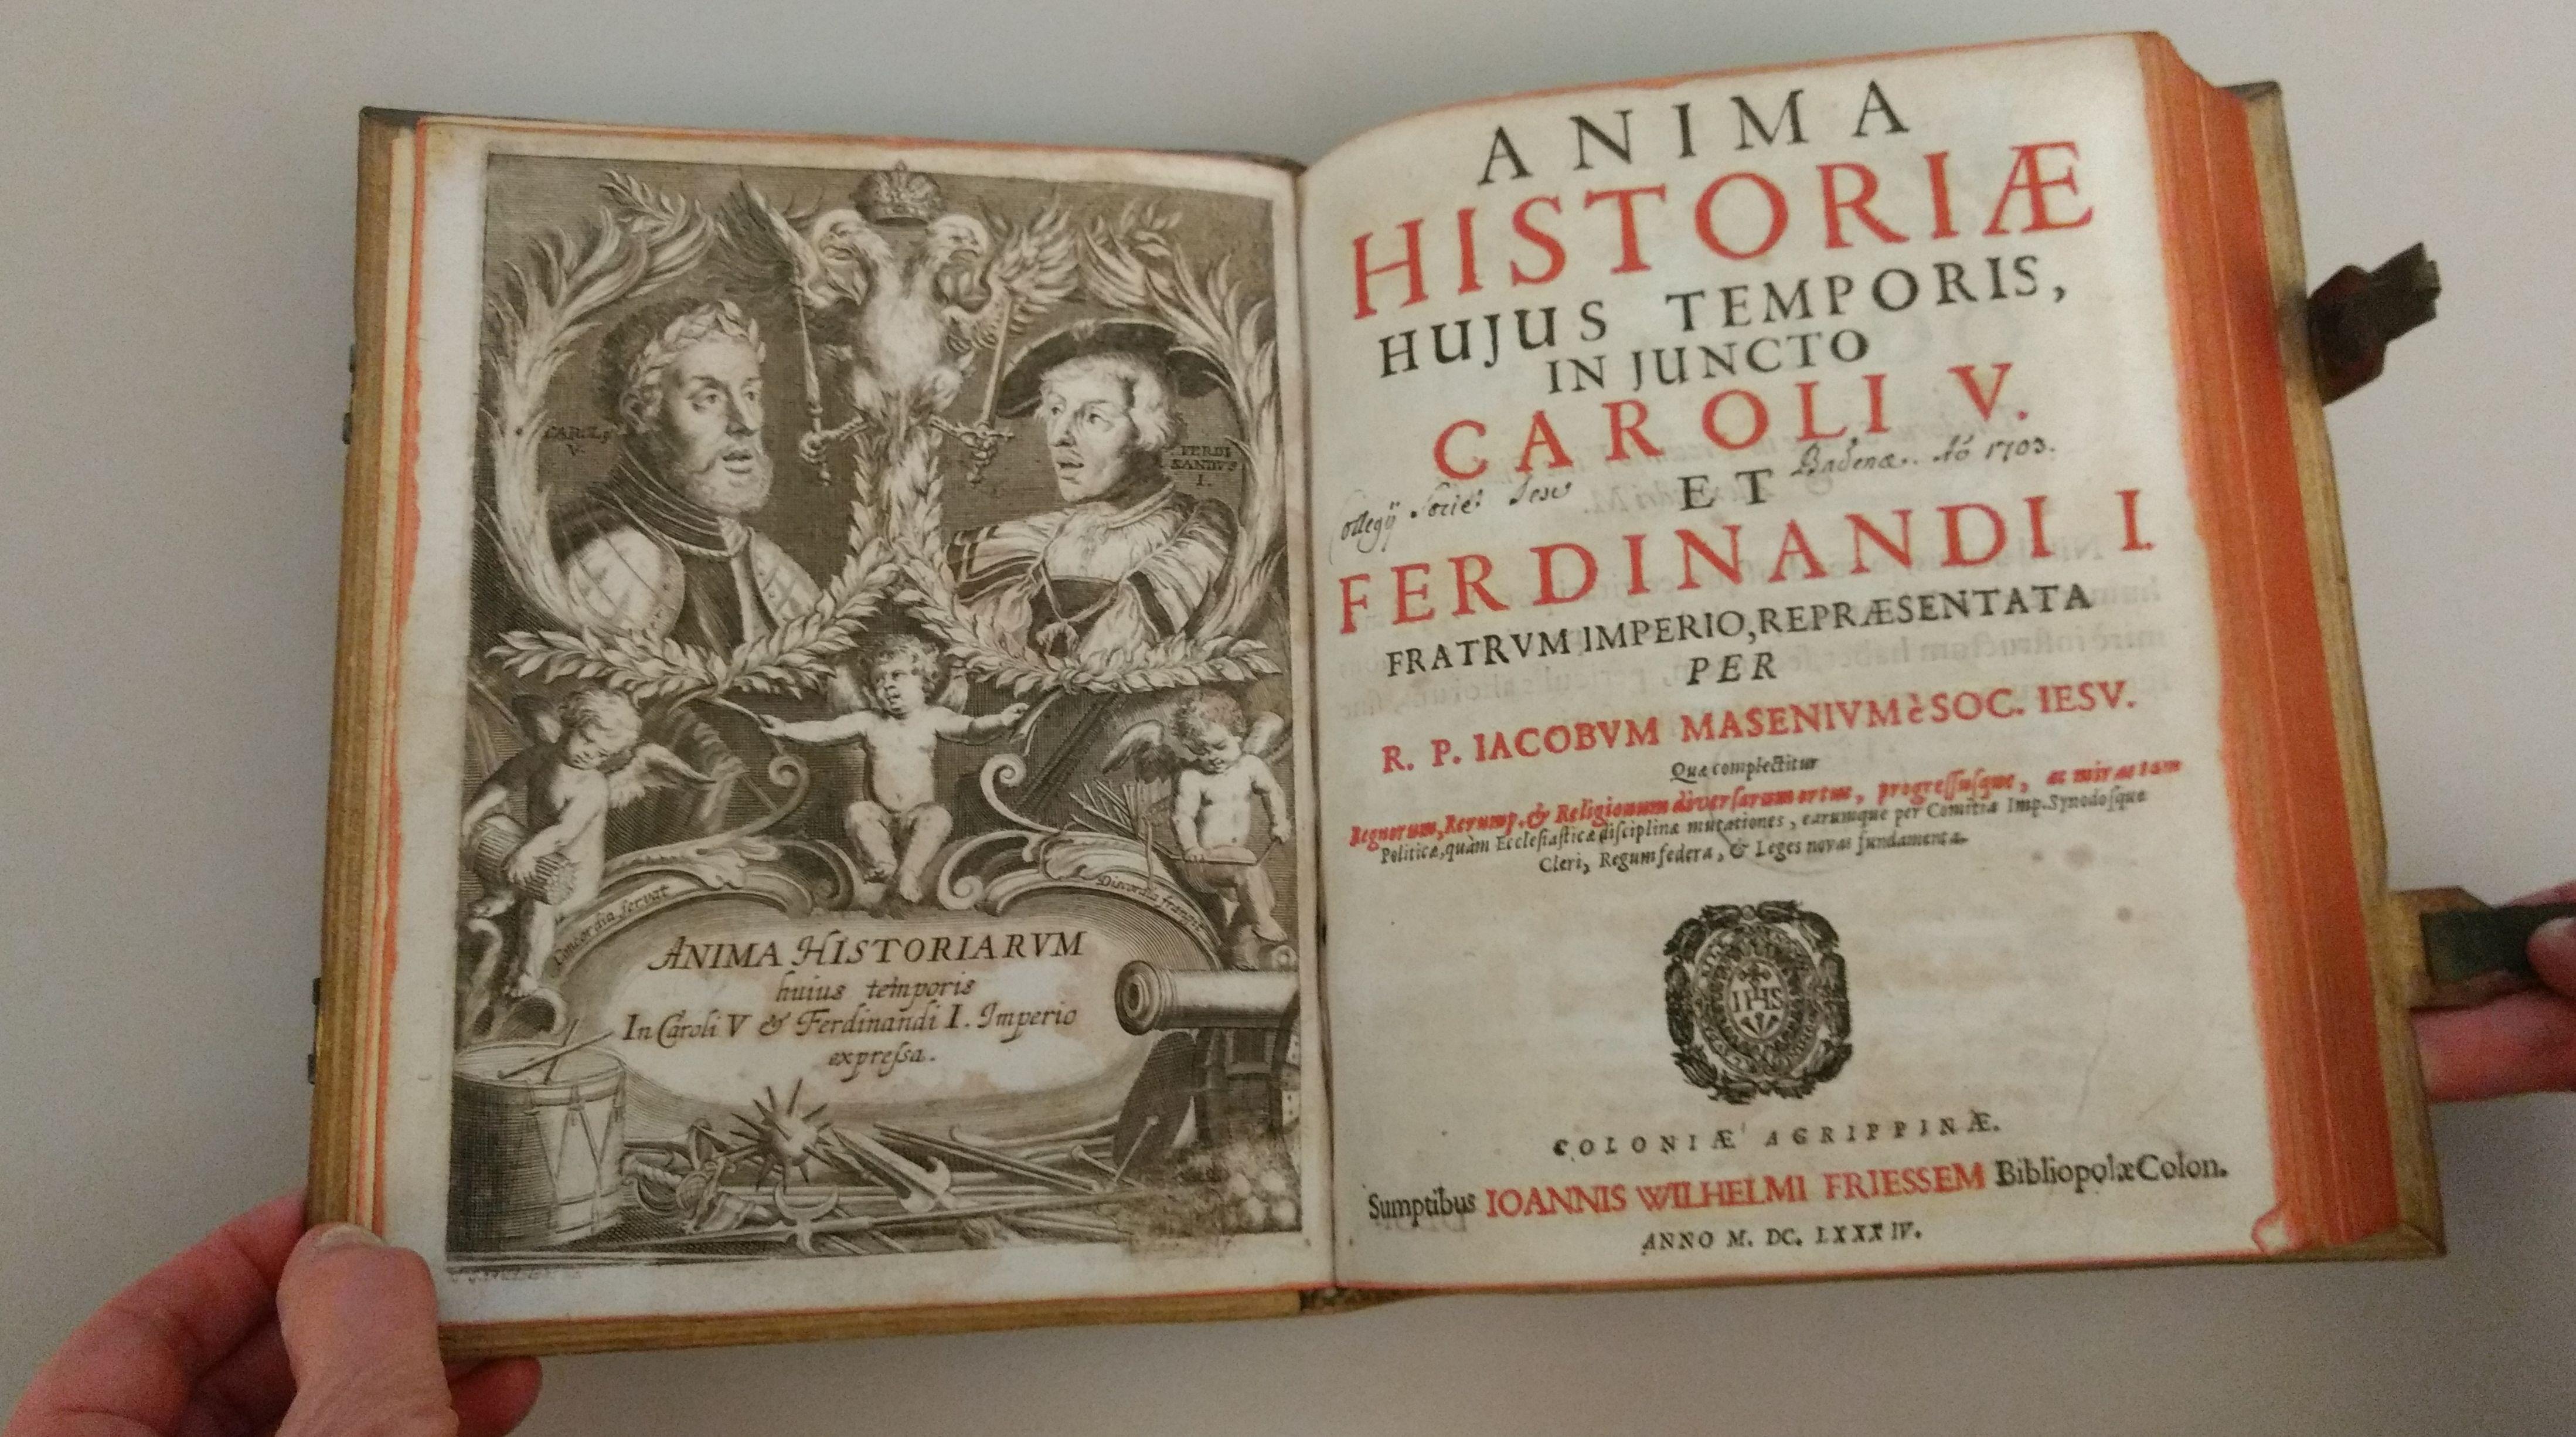 Rastatt historische bibliothek 1684.jpeg